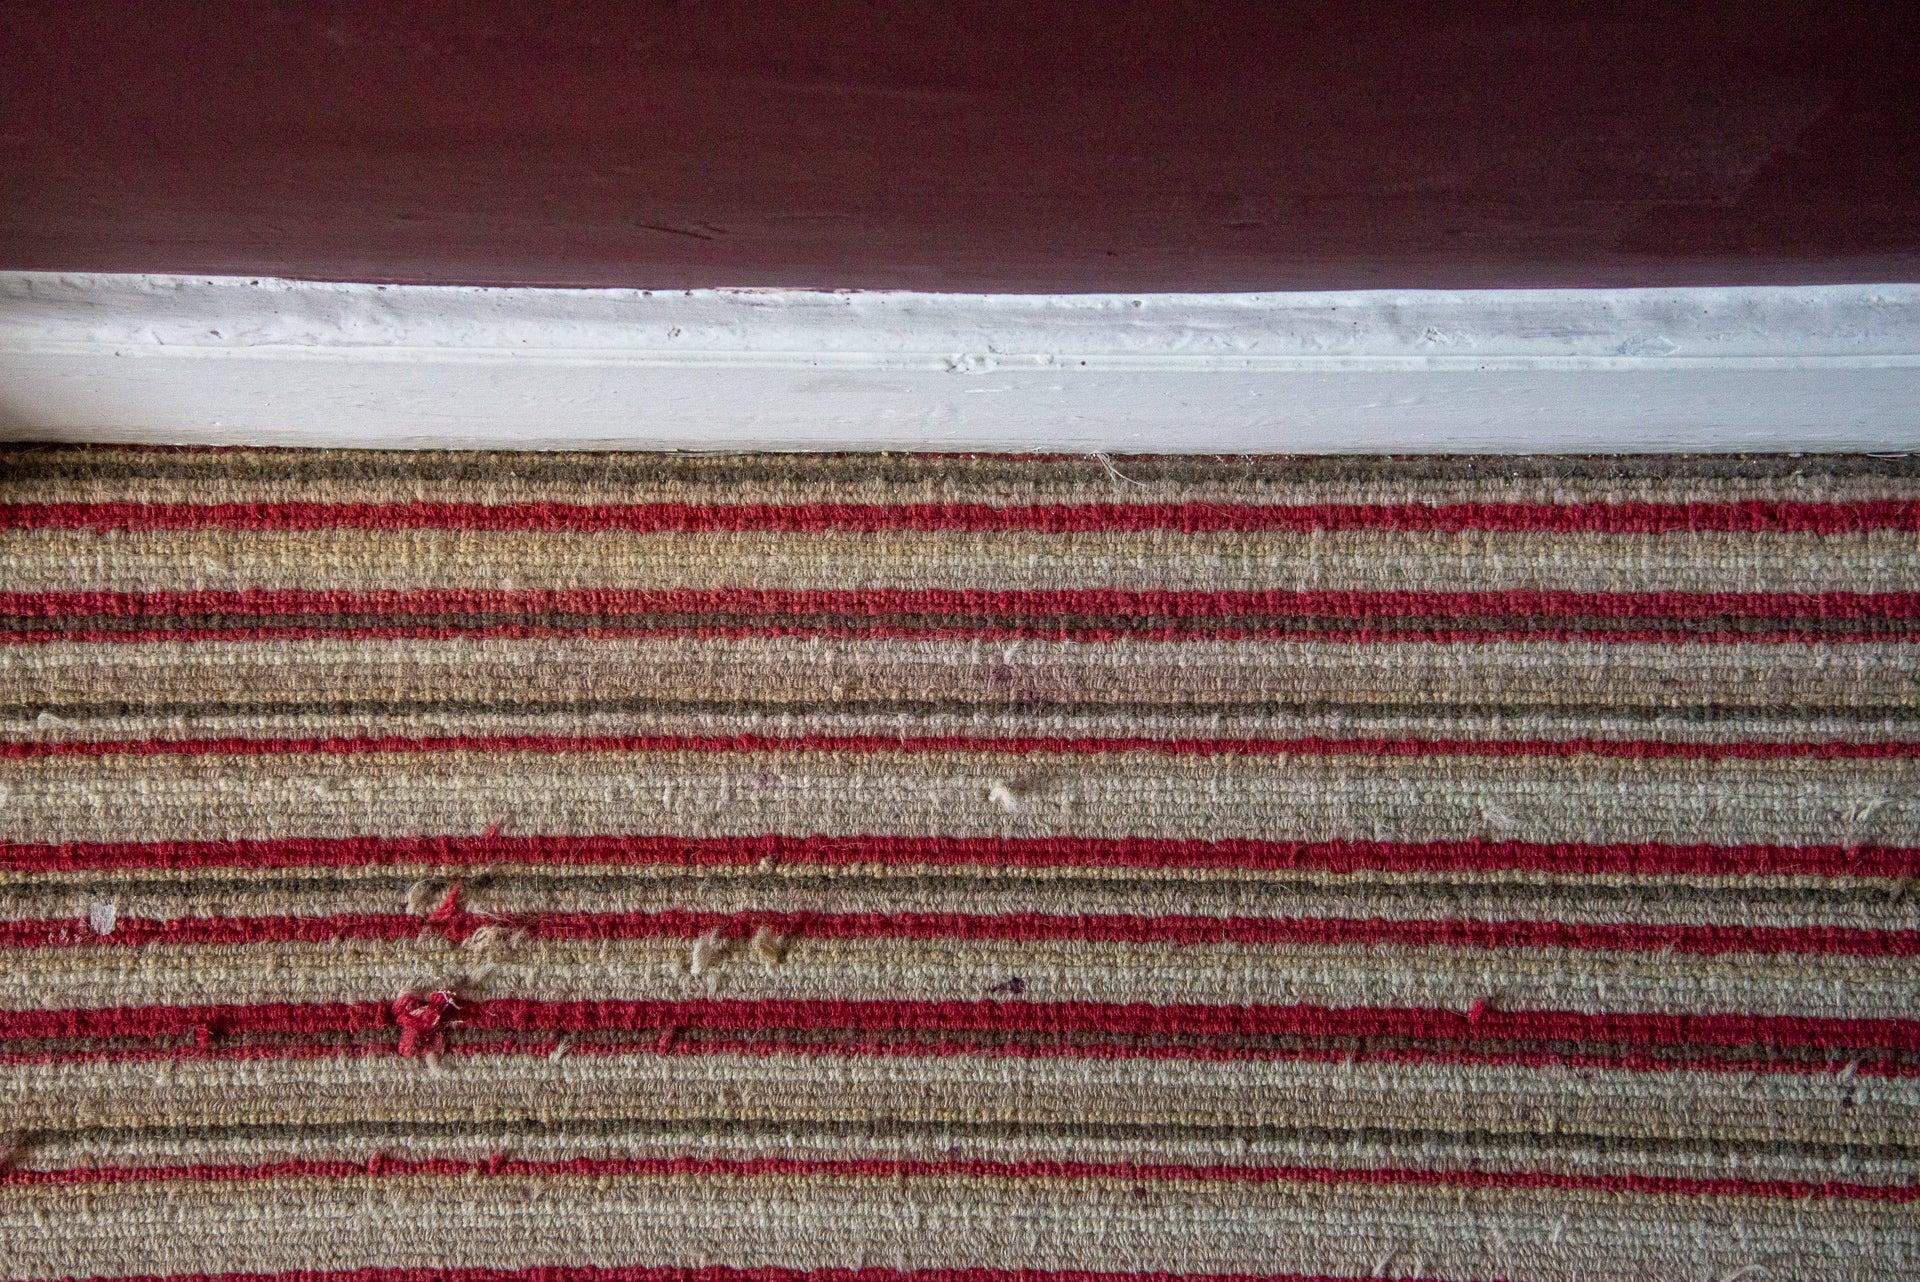 Dyson V11 Absolute clean carpet